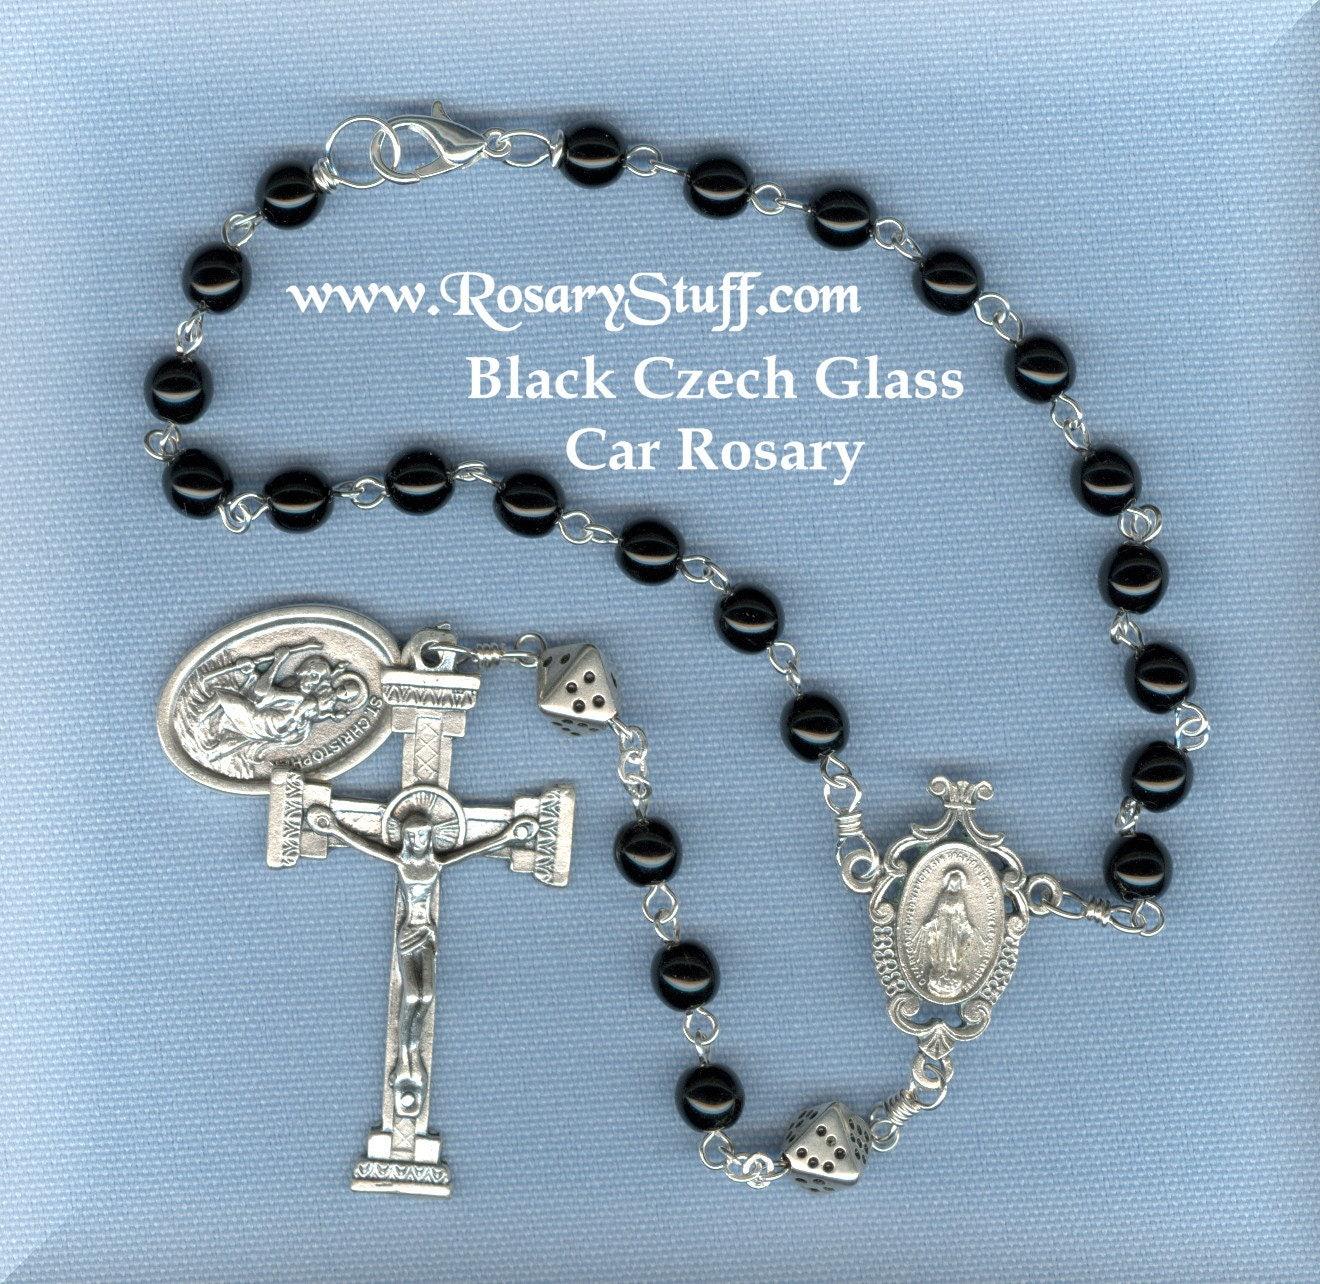 https://www.etsy.com/listing/544547323/handmade-jet-black-czech-glass-car?ref=shop_home_active_1